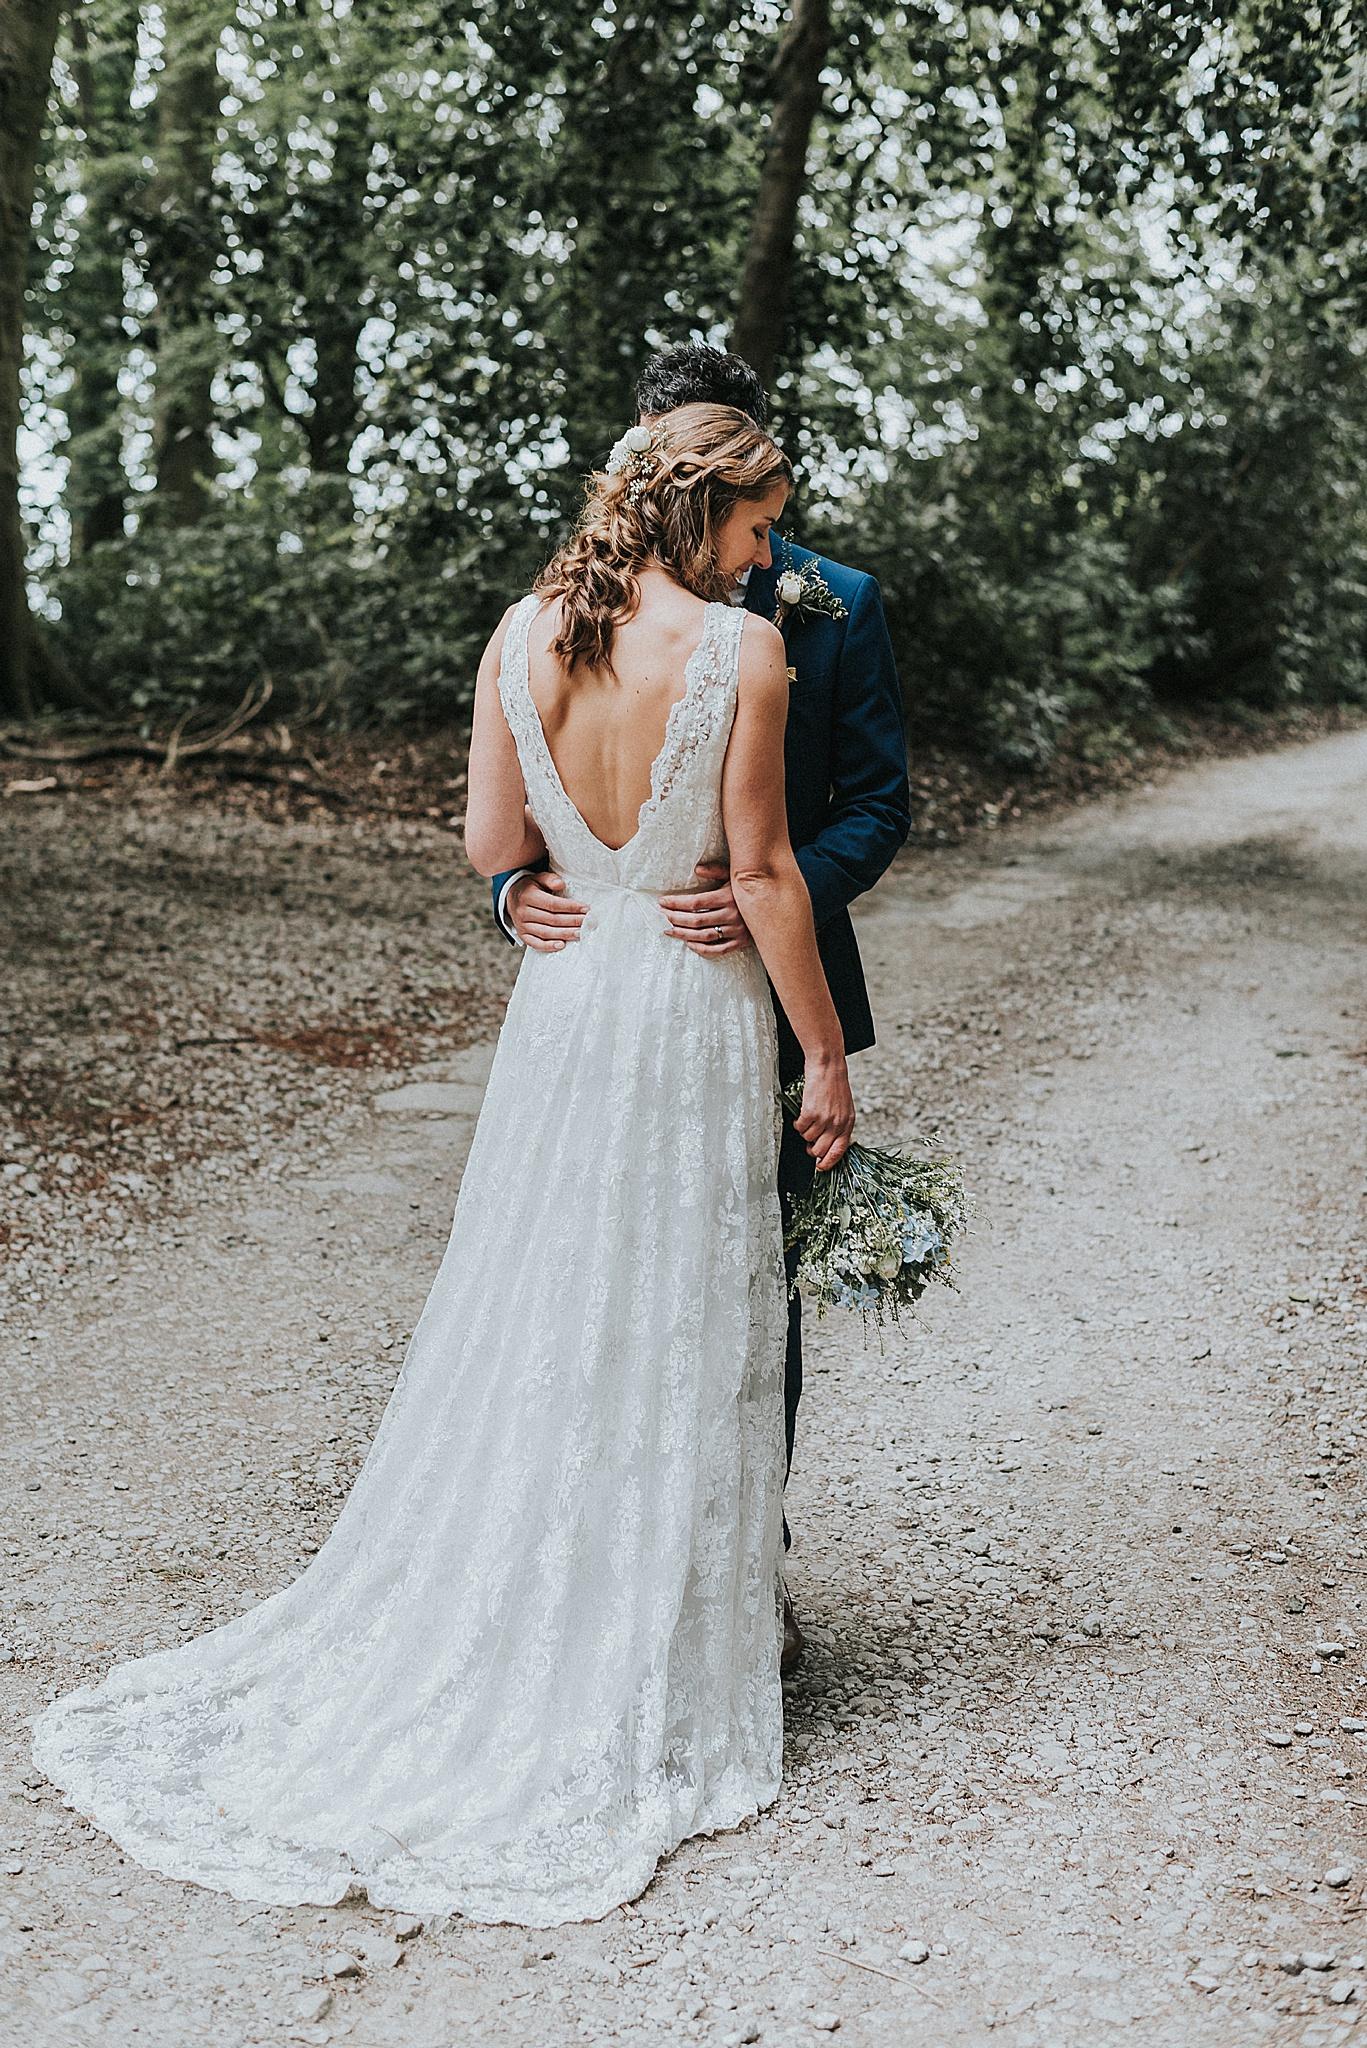 natural wedding photographer in preston